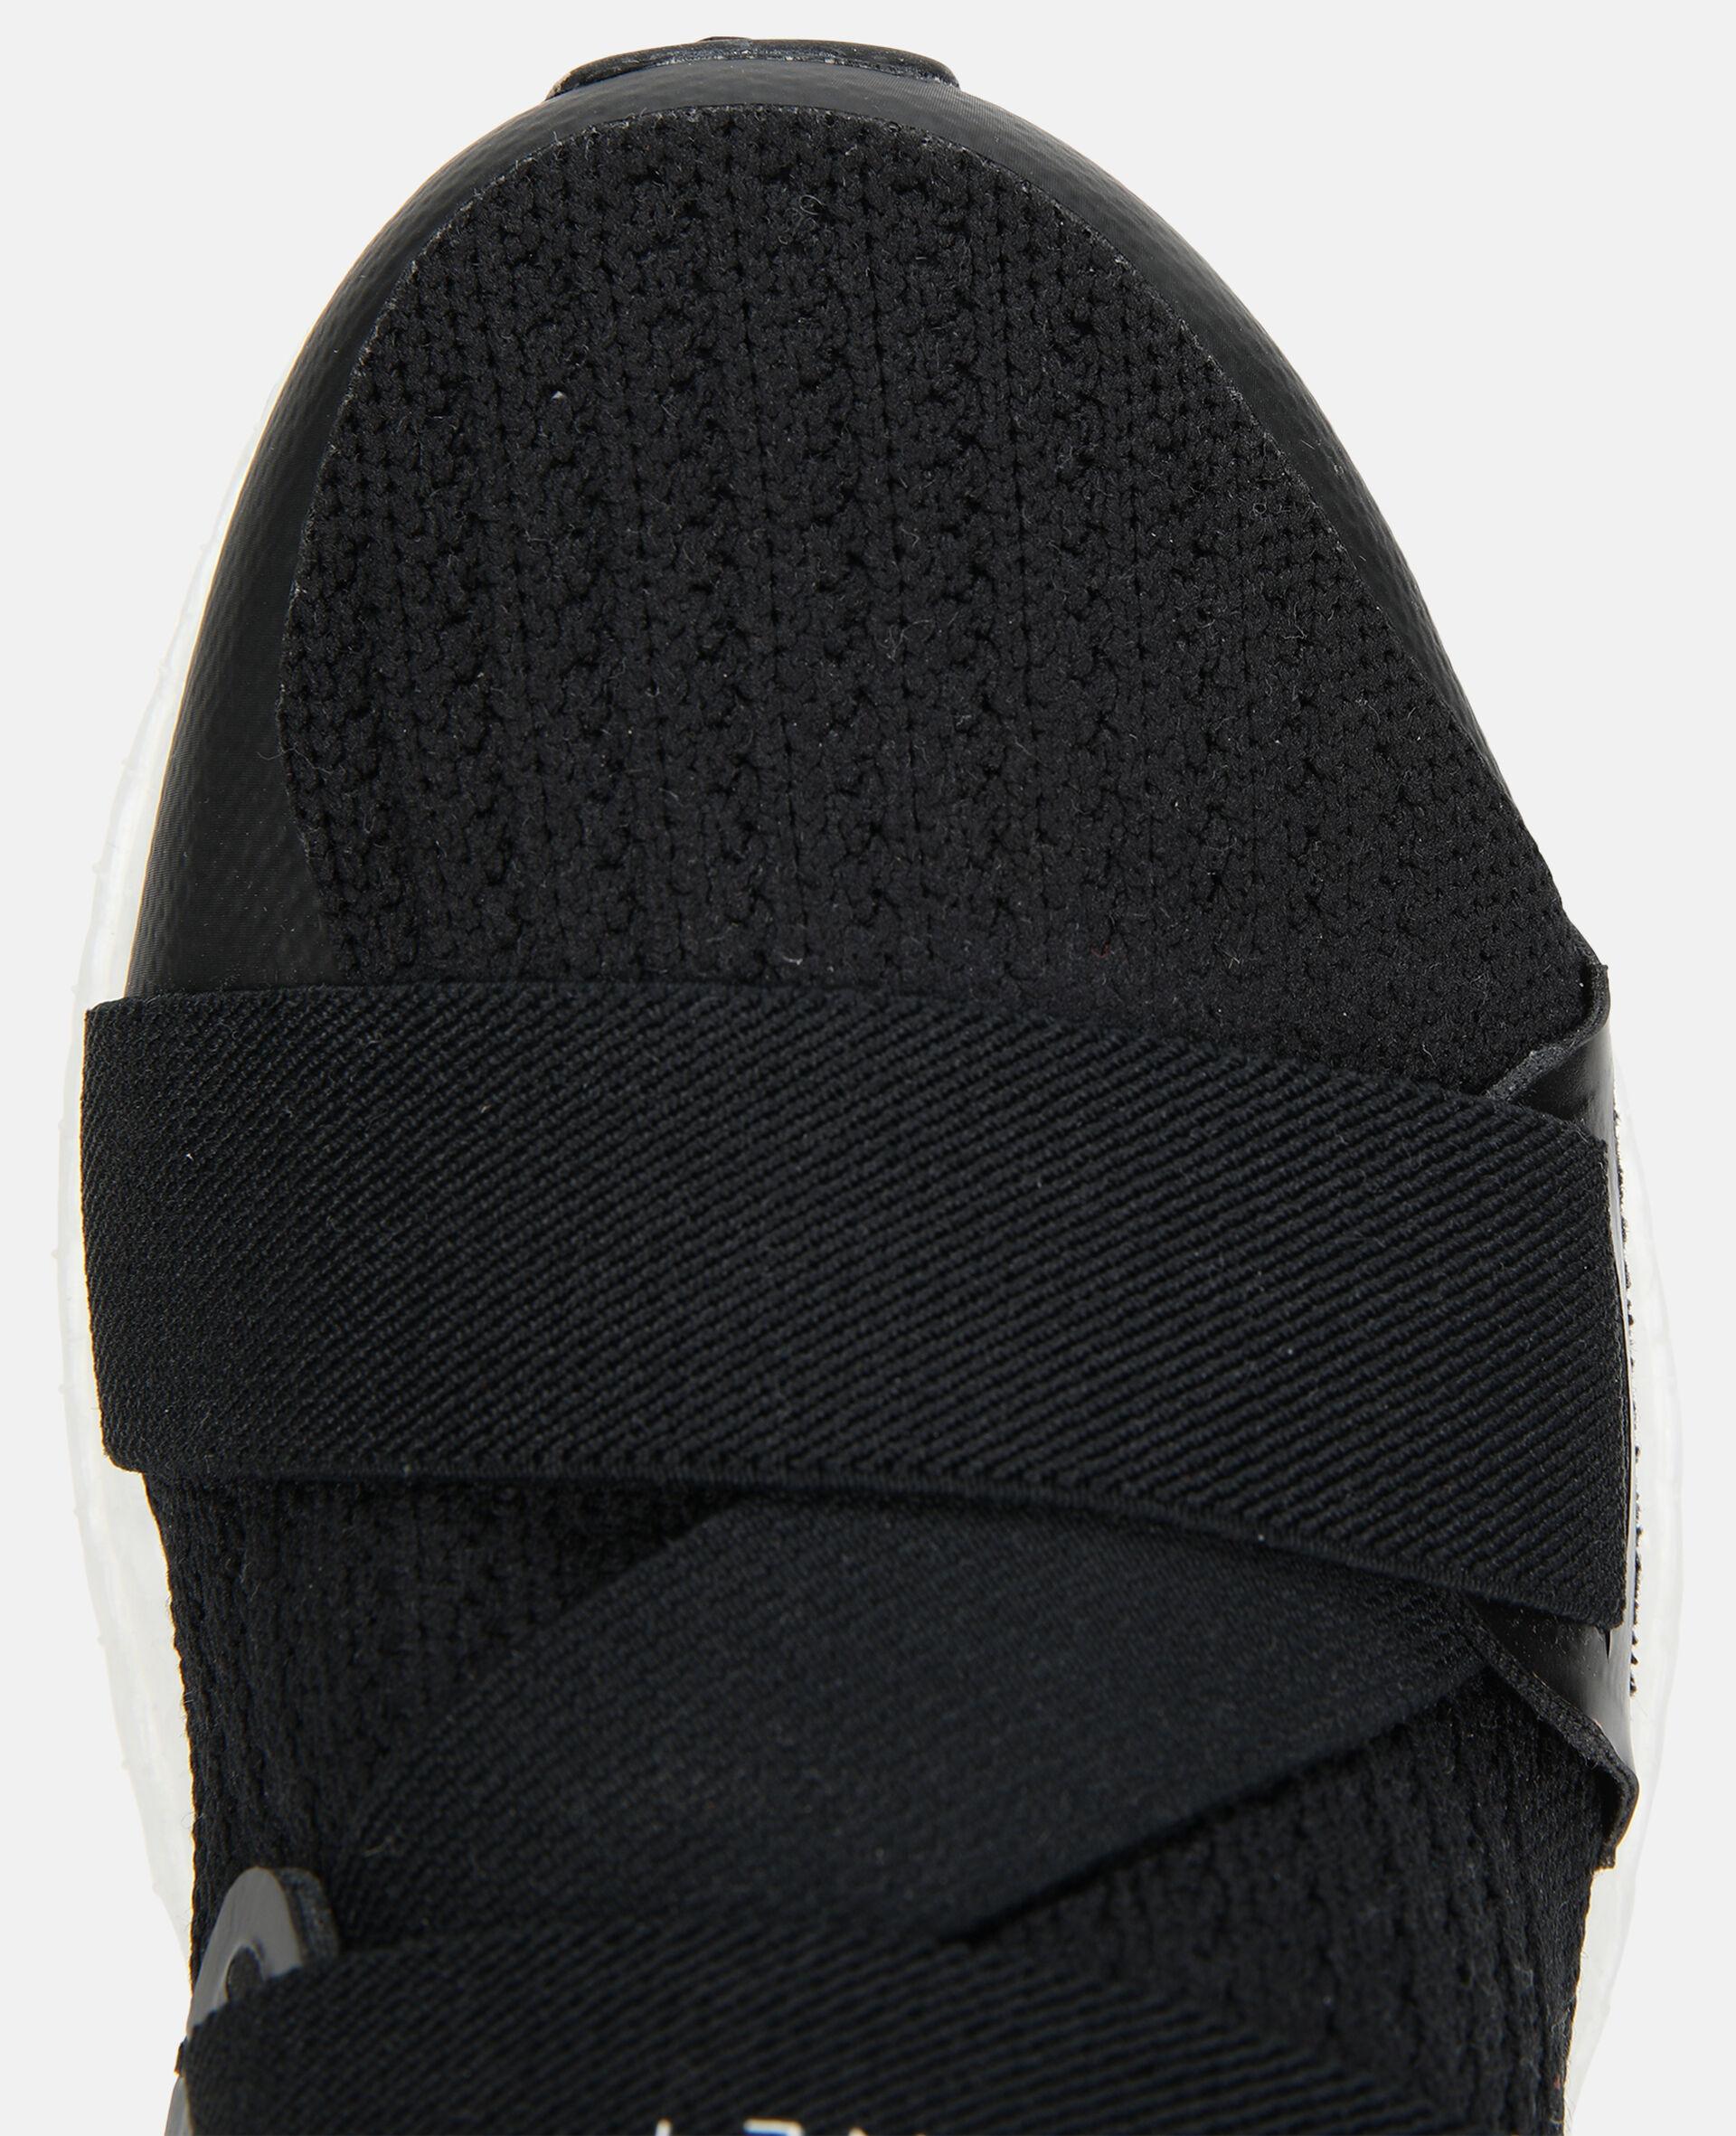 Black Ultraboost X Trainers-Black-large image number 3